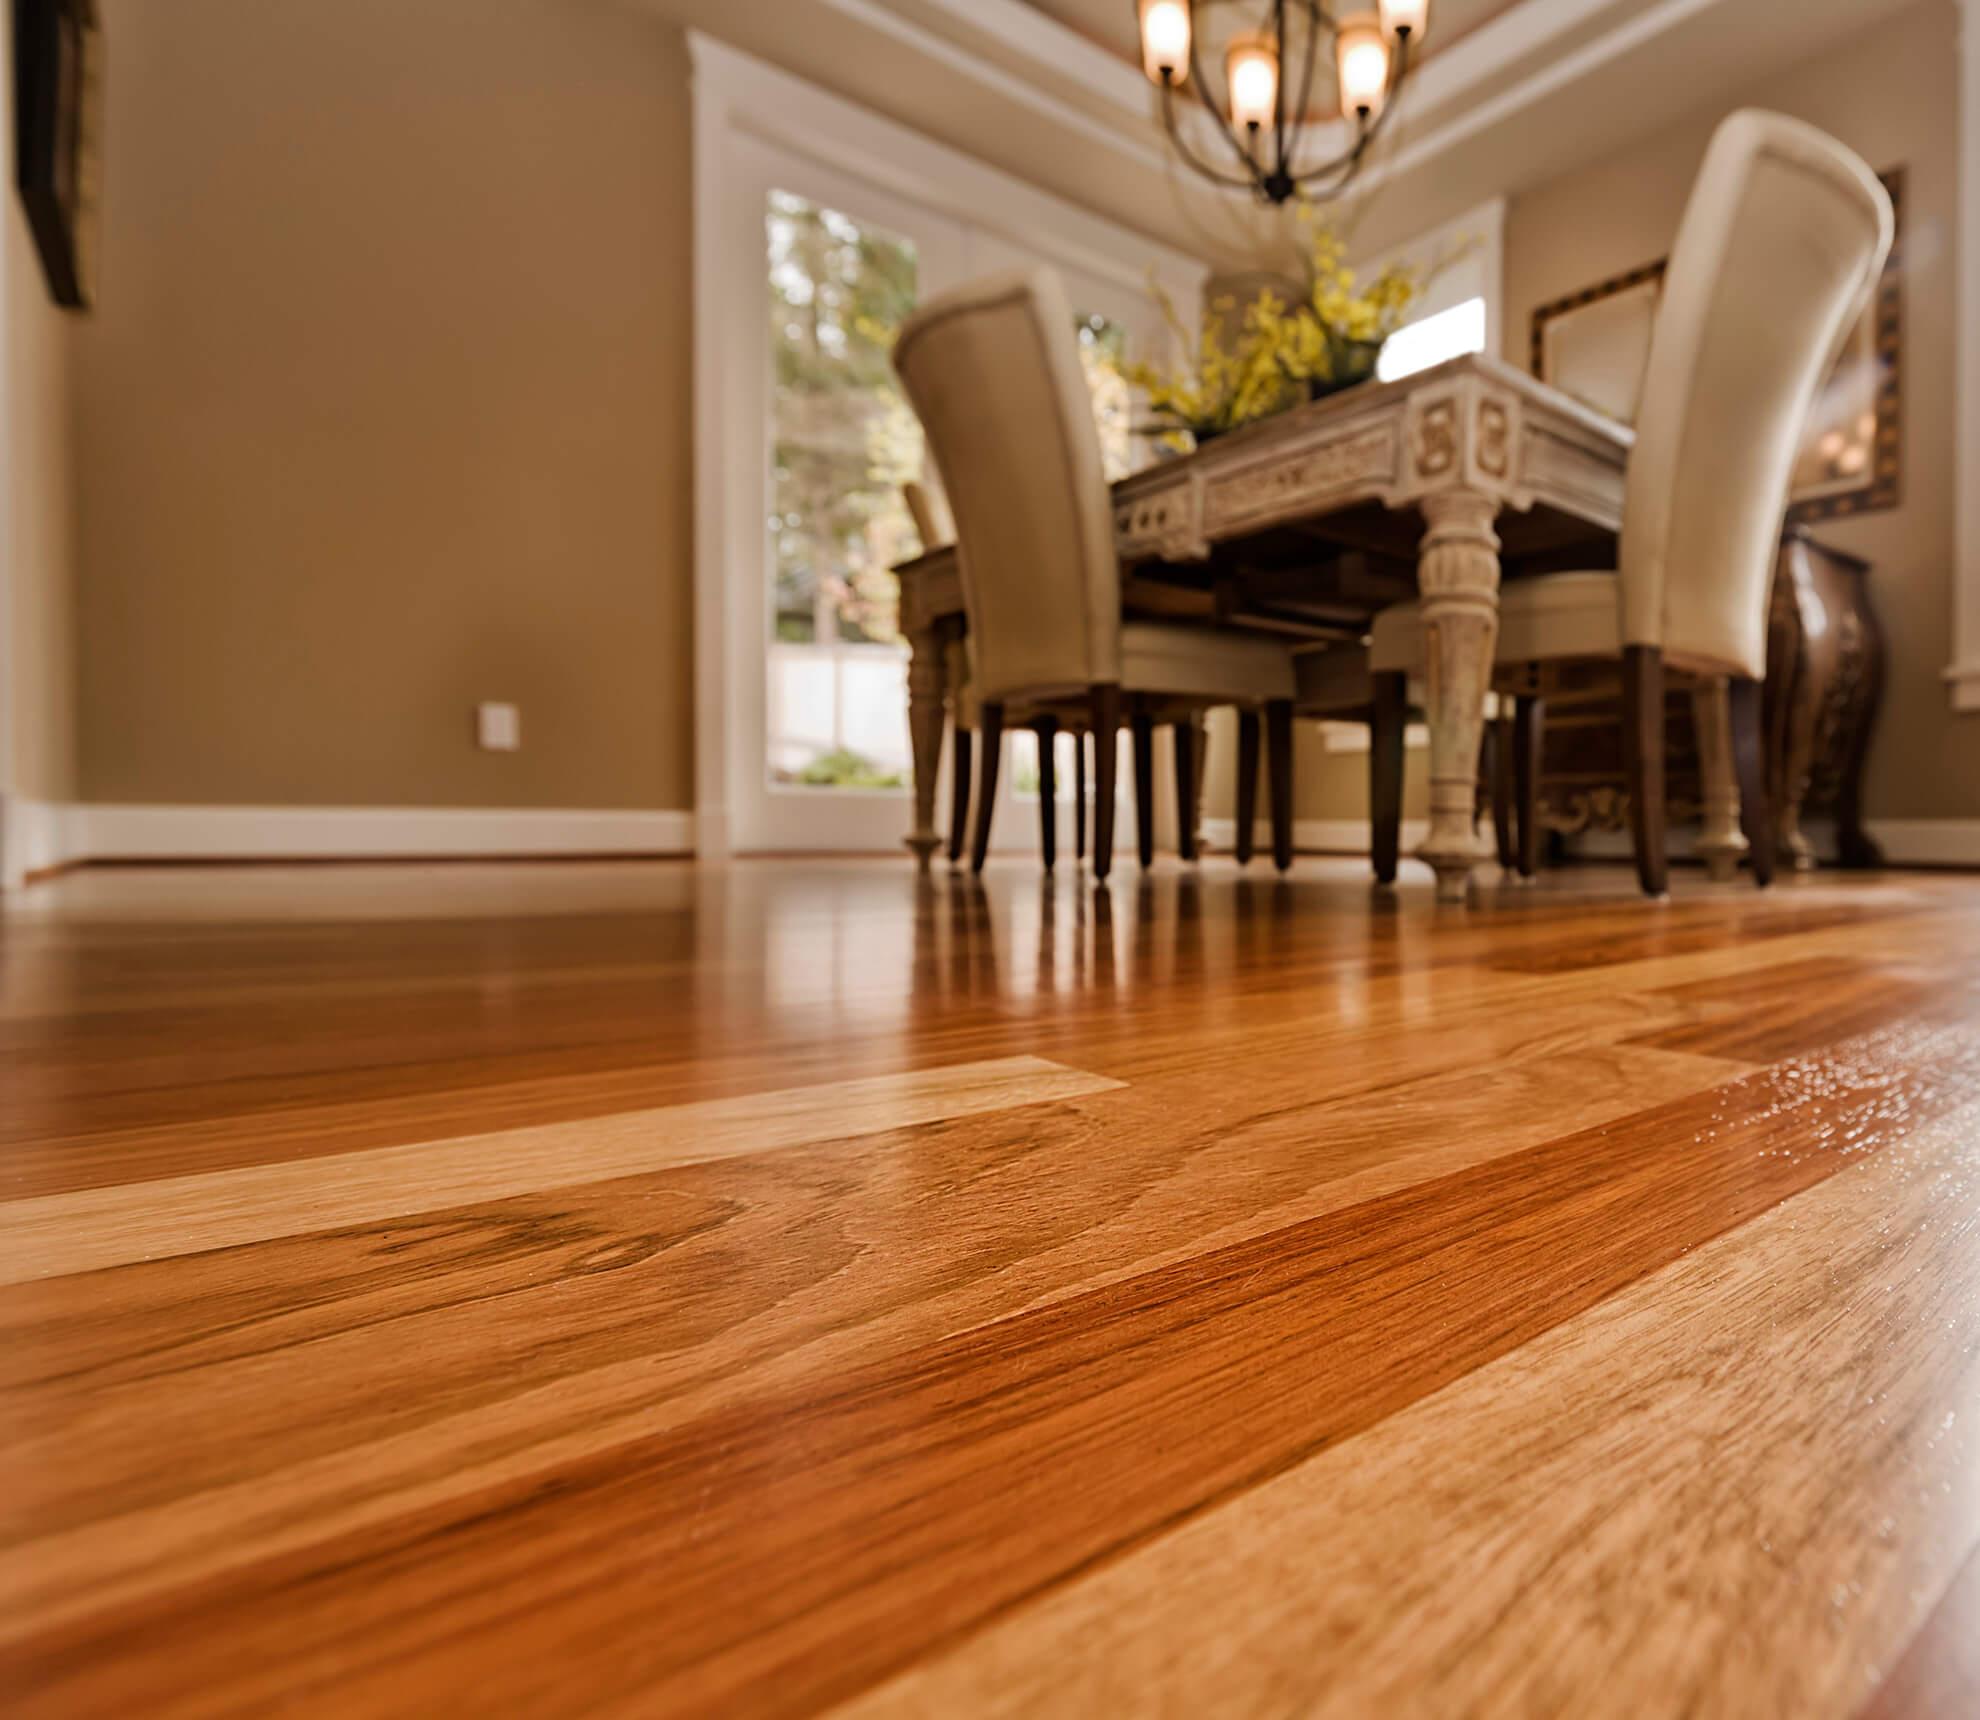 Wood Floor Cleaning Cleaning Laminate Wood Floors Swiffer